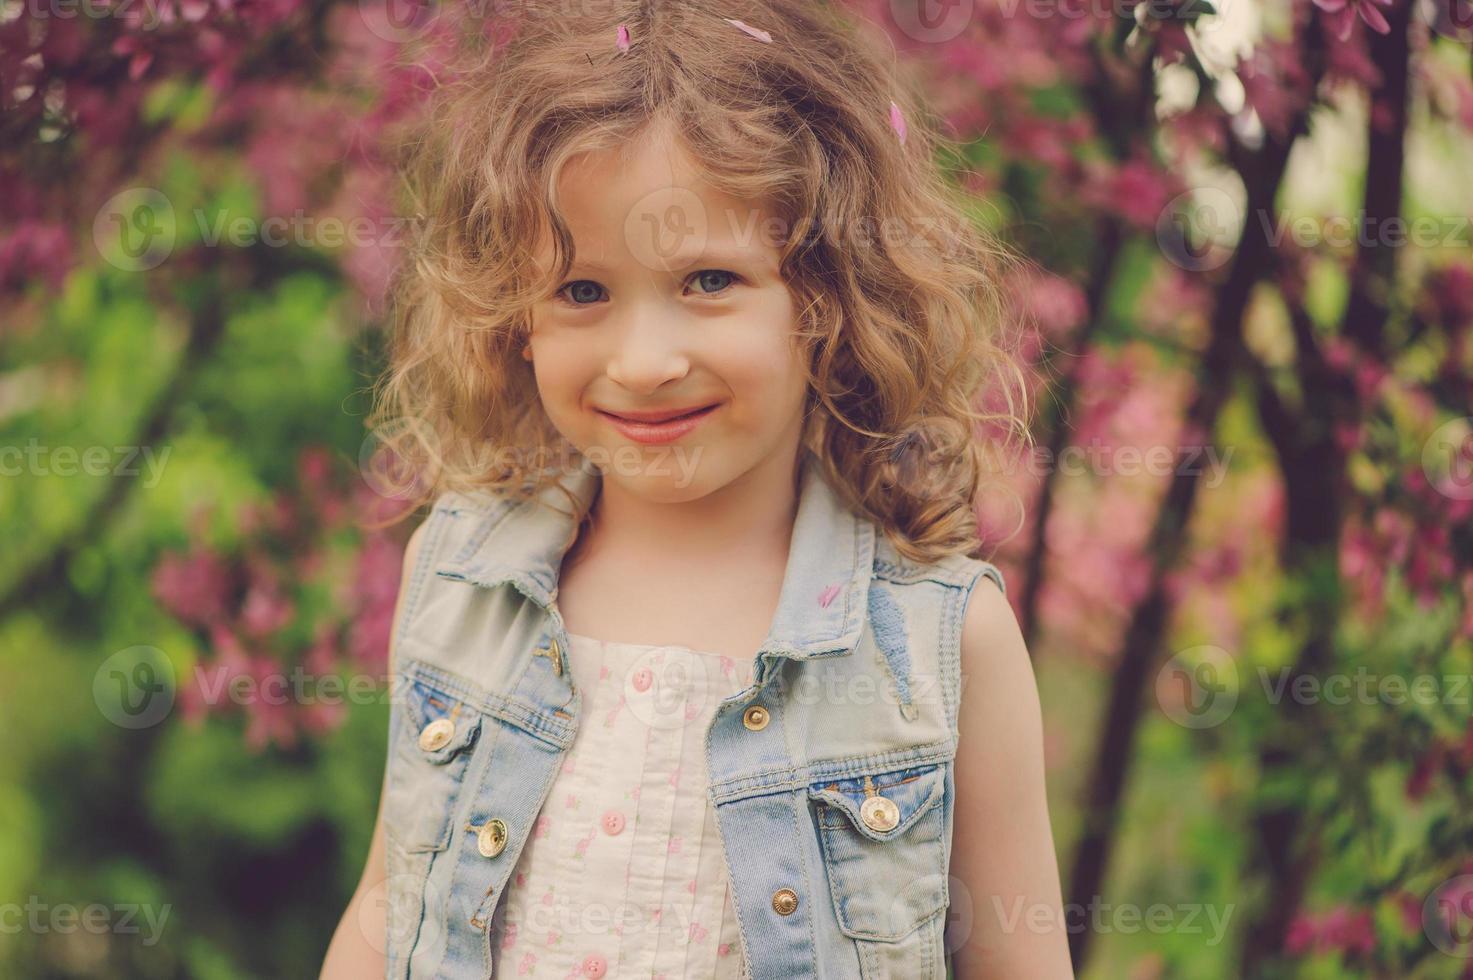 cute child girl enjoying spring in cozy country garden photo